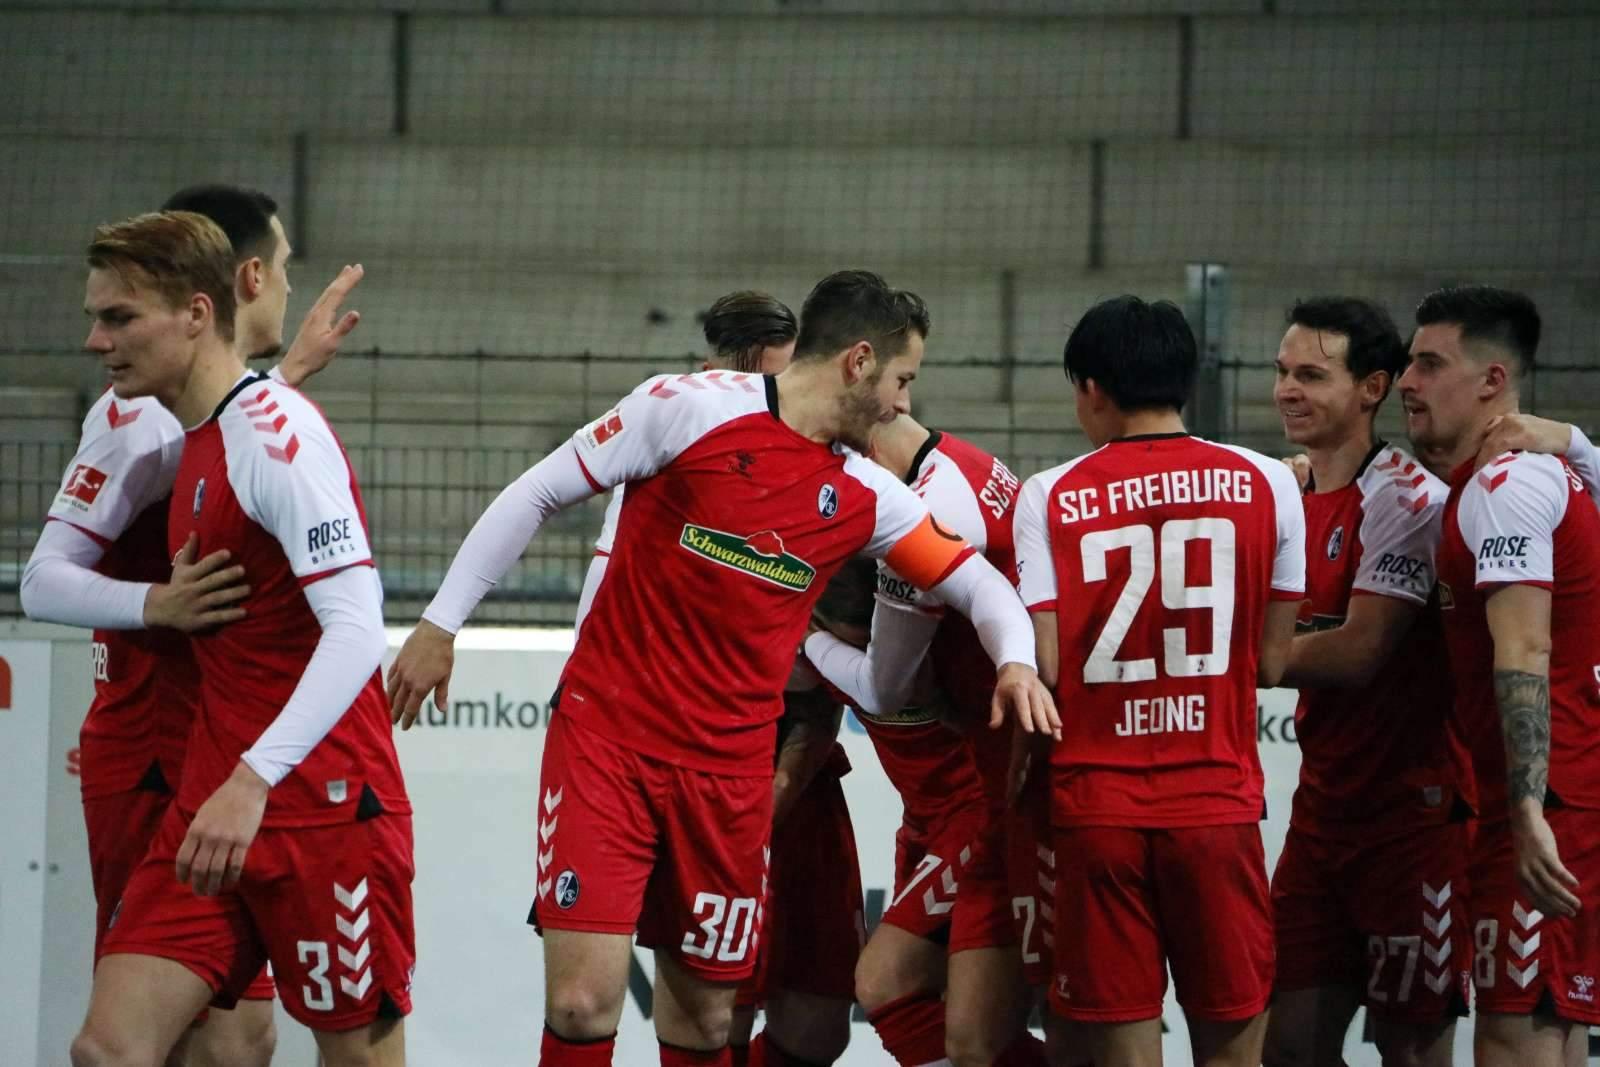 «Фрайбург» - «Аугсбург»: прогноз и ставка на матч чемпионата Германии – 26 сентября 2021